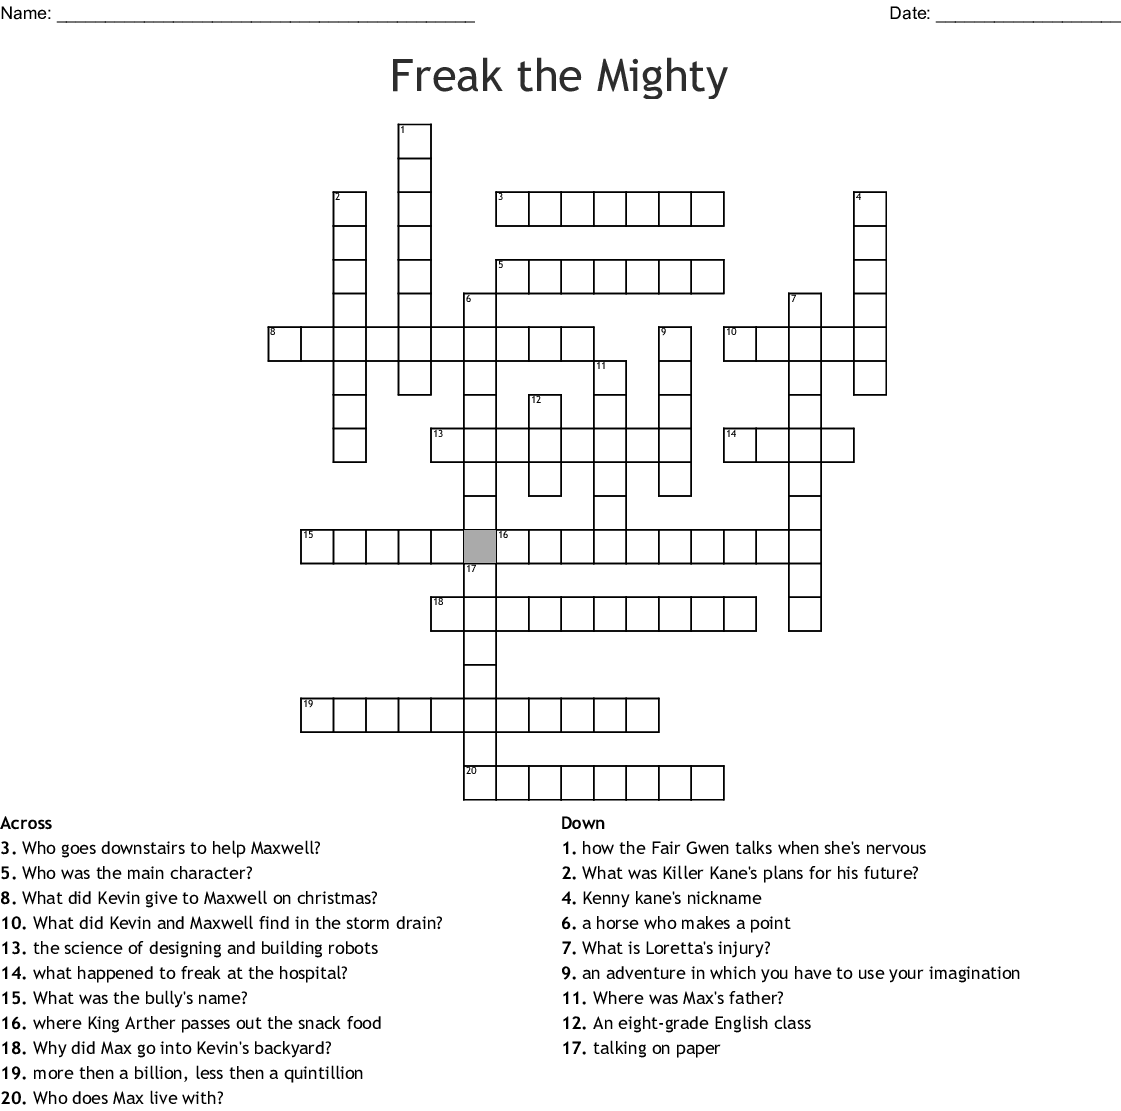 Freak The Mighty Crossword